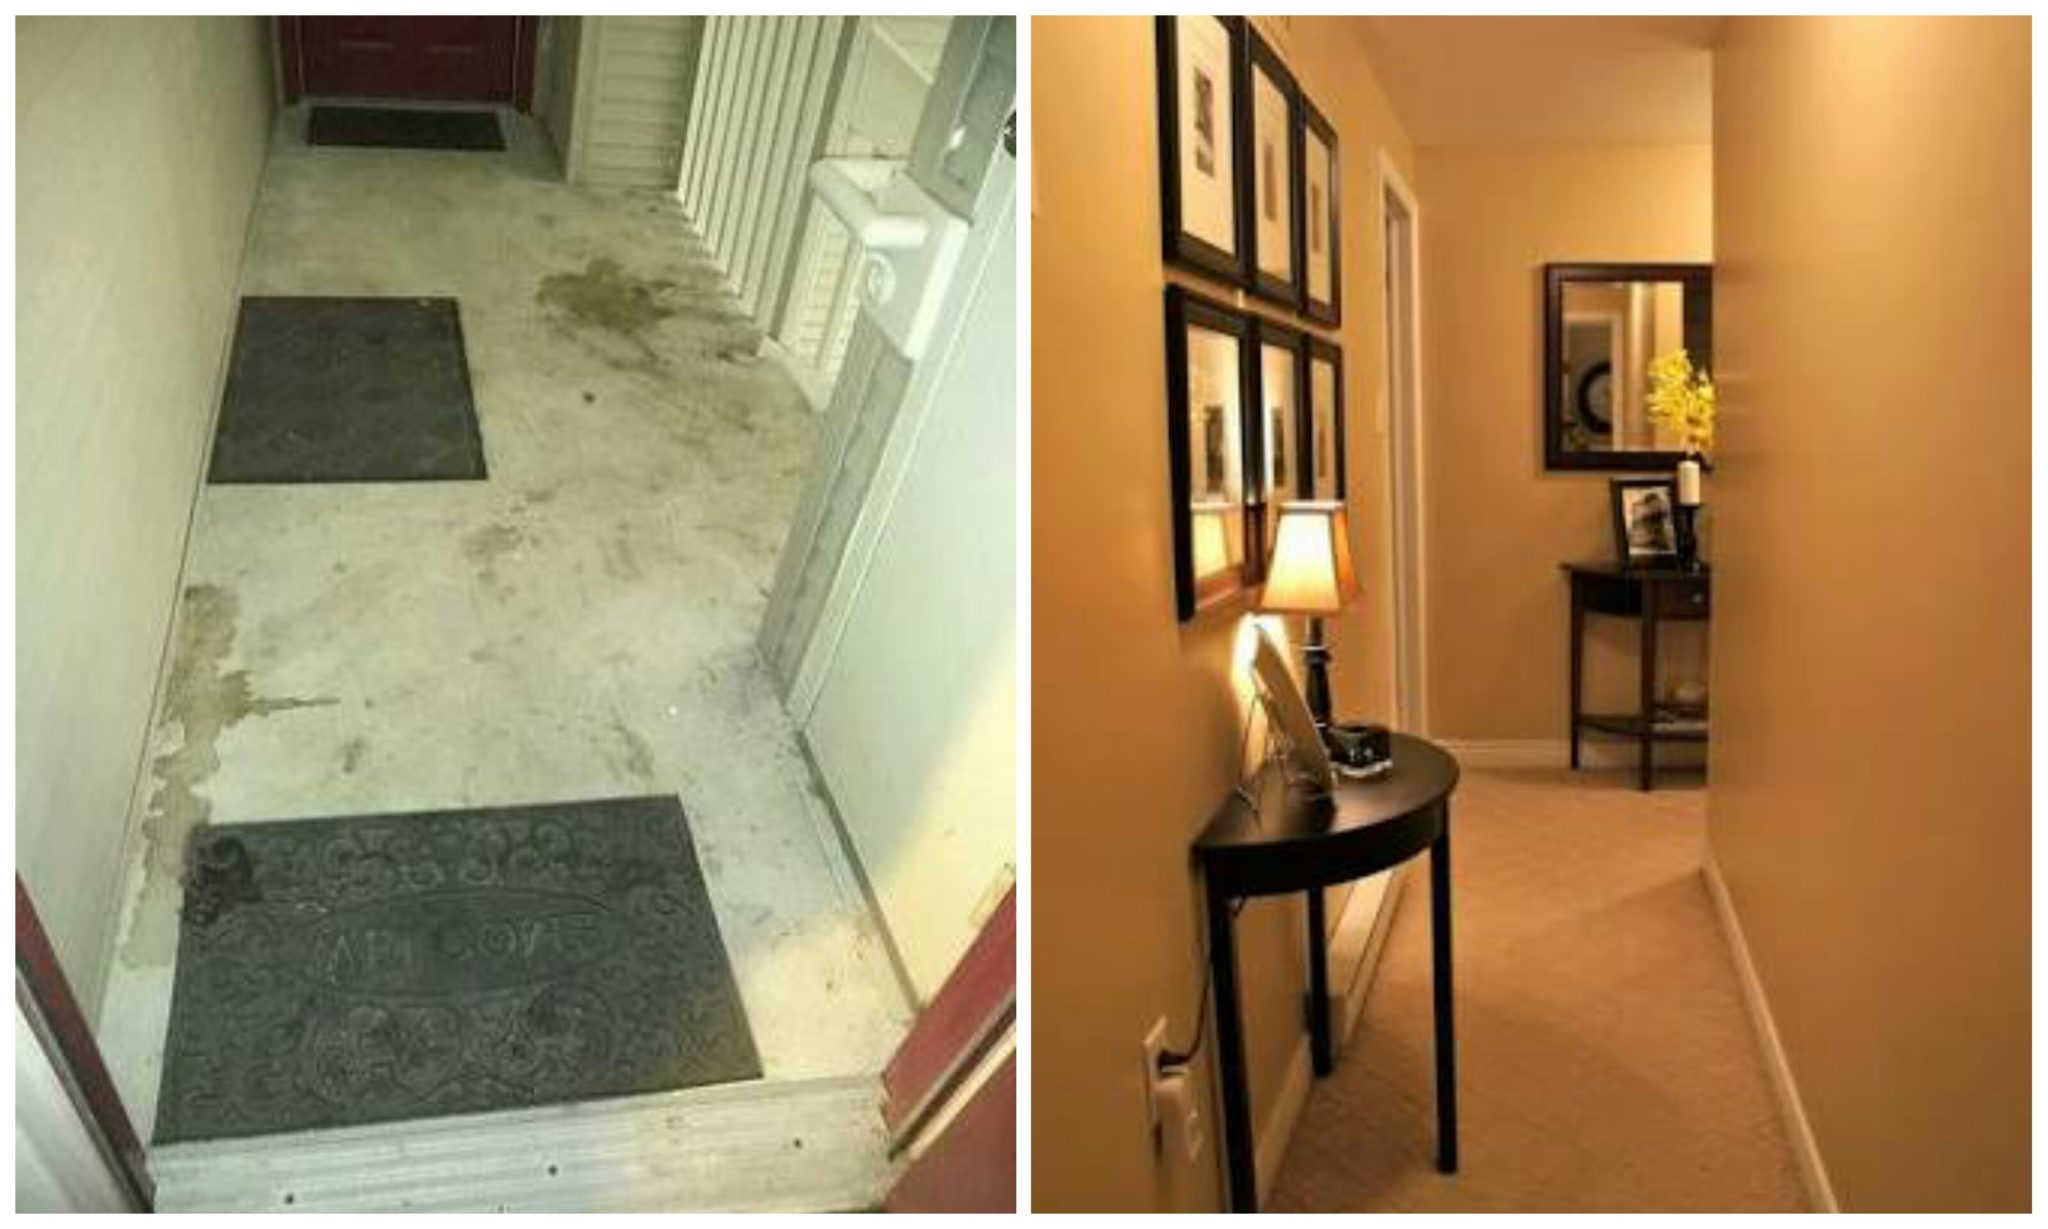 Ignored hallway vs. Decorated hallway